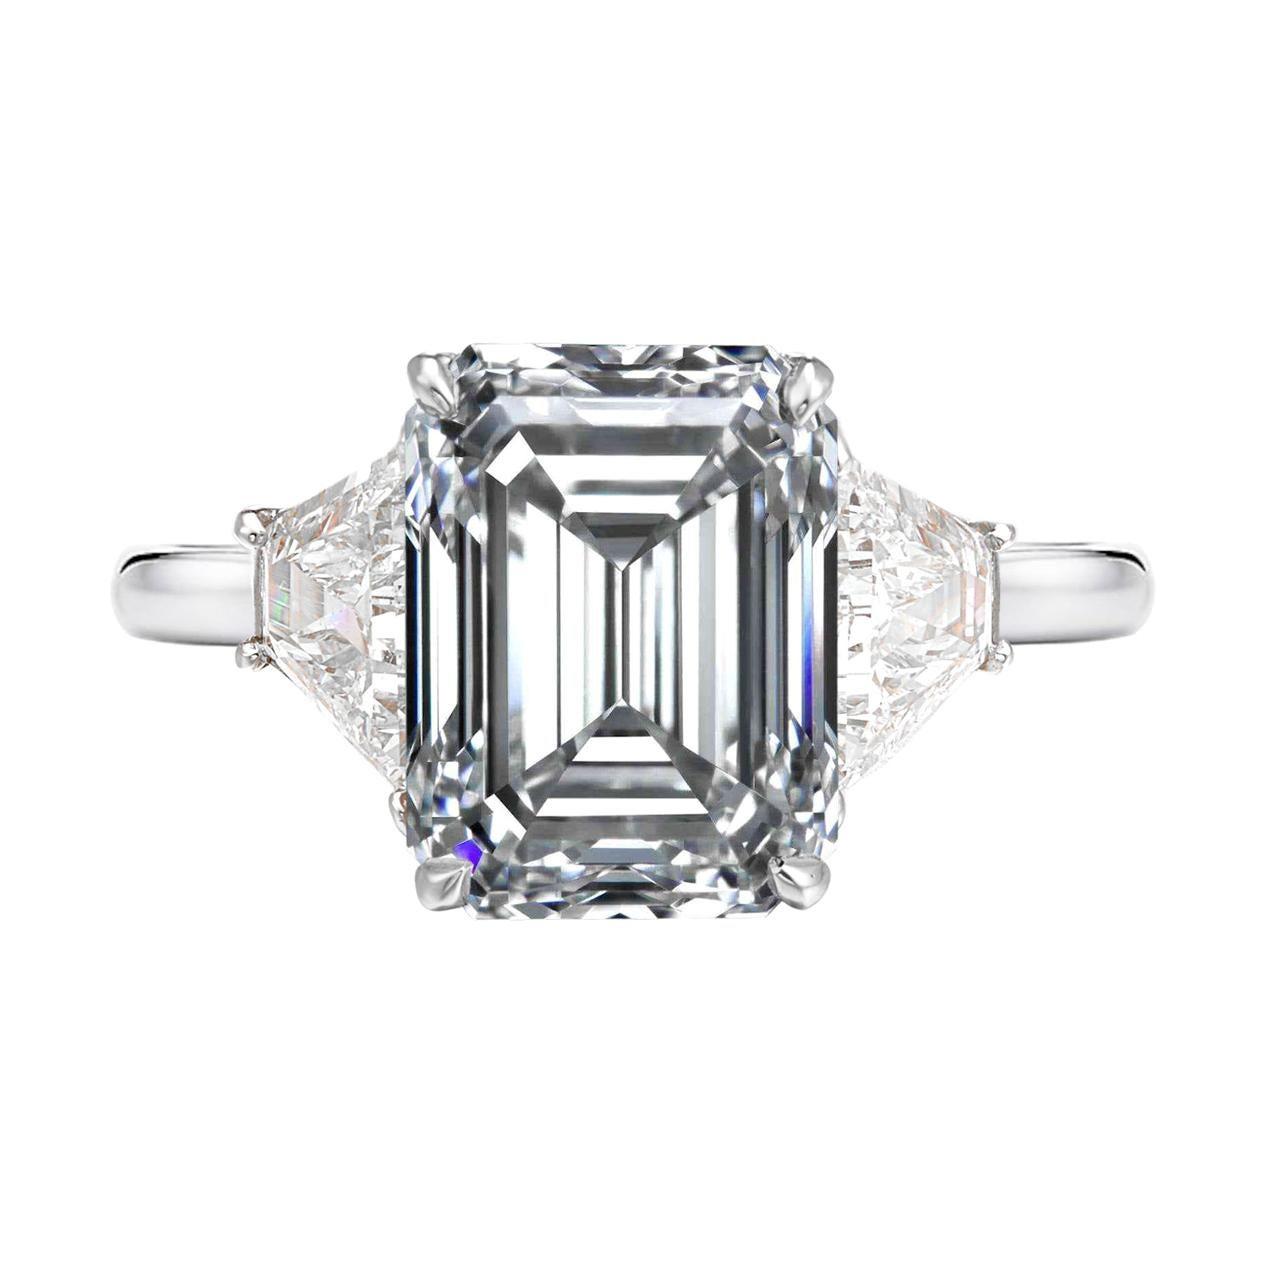 GIA Certified 2.65 Carat Emerald Cut Halfmoon Diamond Platinum Ring F VS1